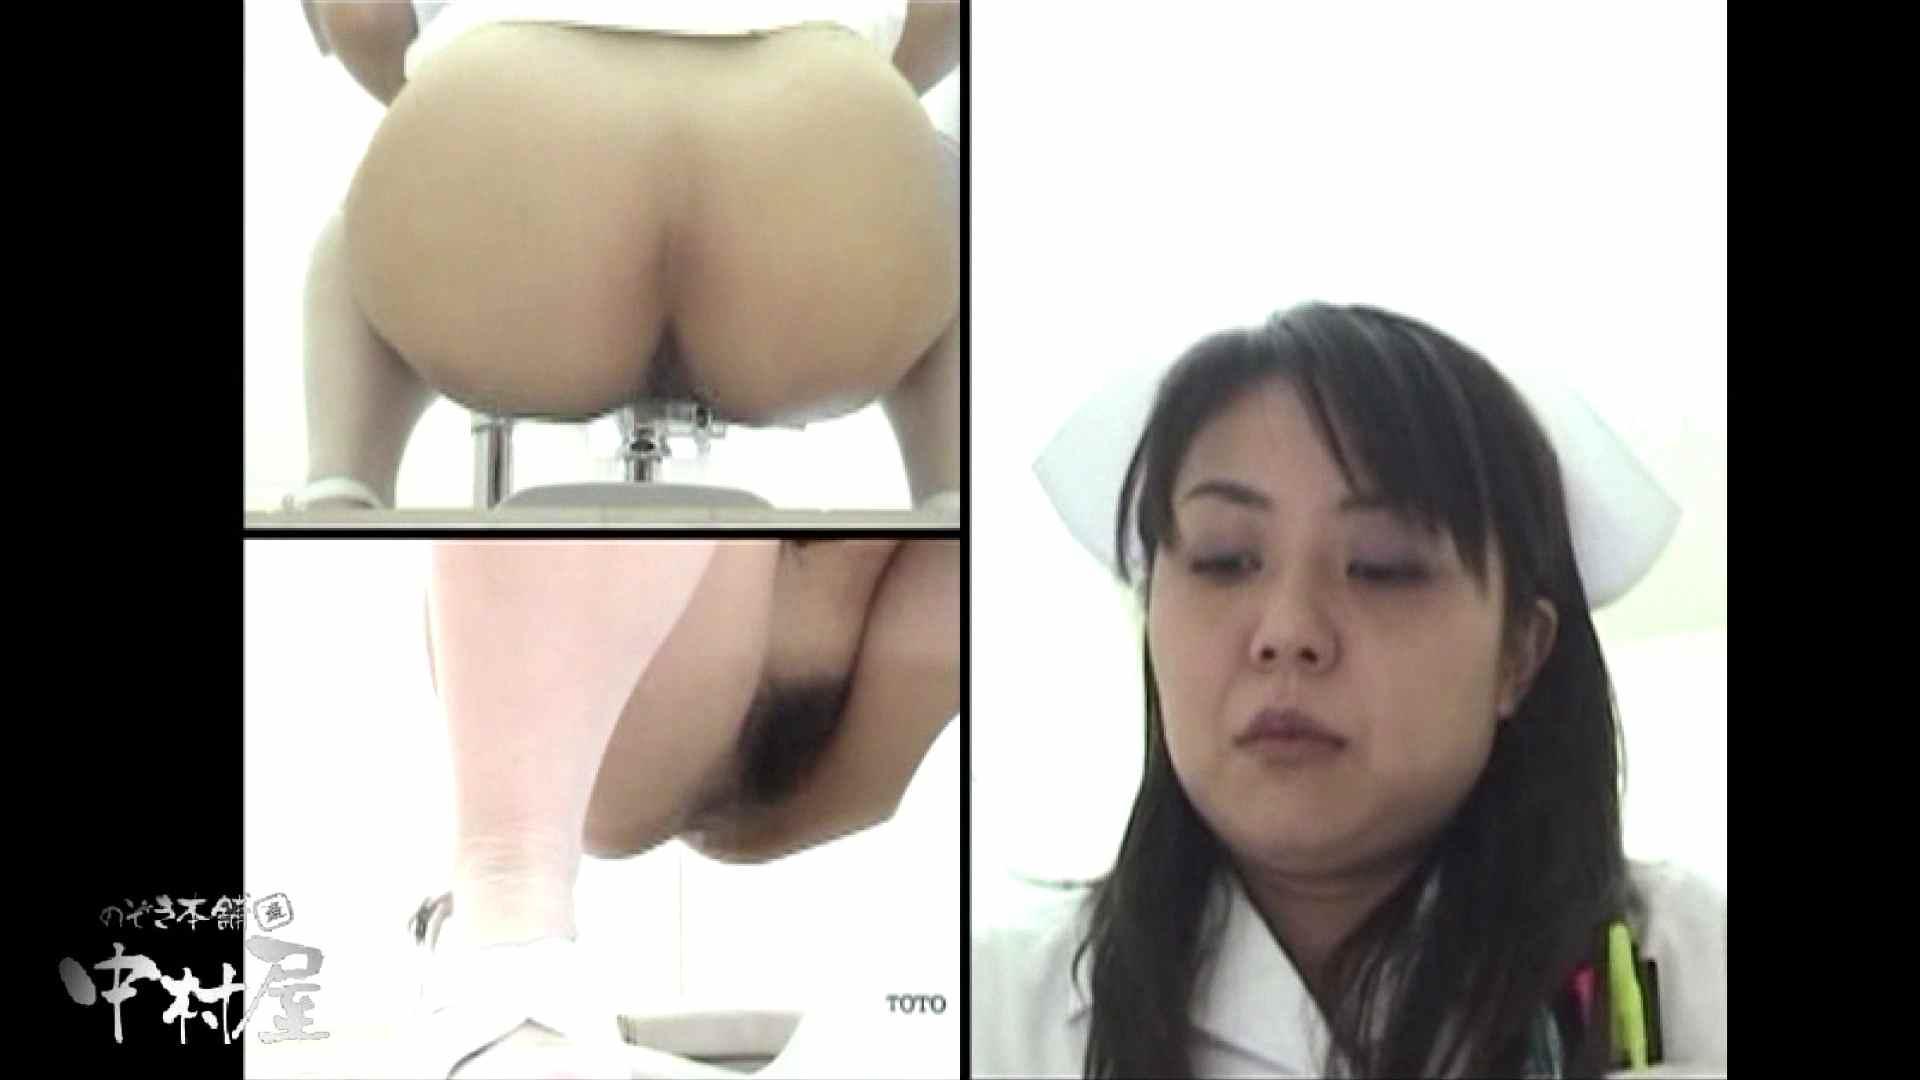 都内某大学病院編 和式イ更所盗撮 その⑫ 4名 排泄 セックス無修正動画無料 67連発 34